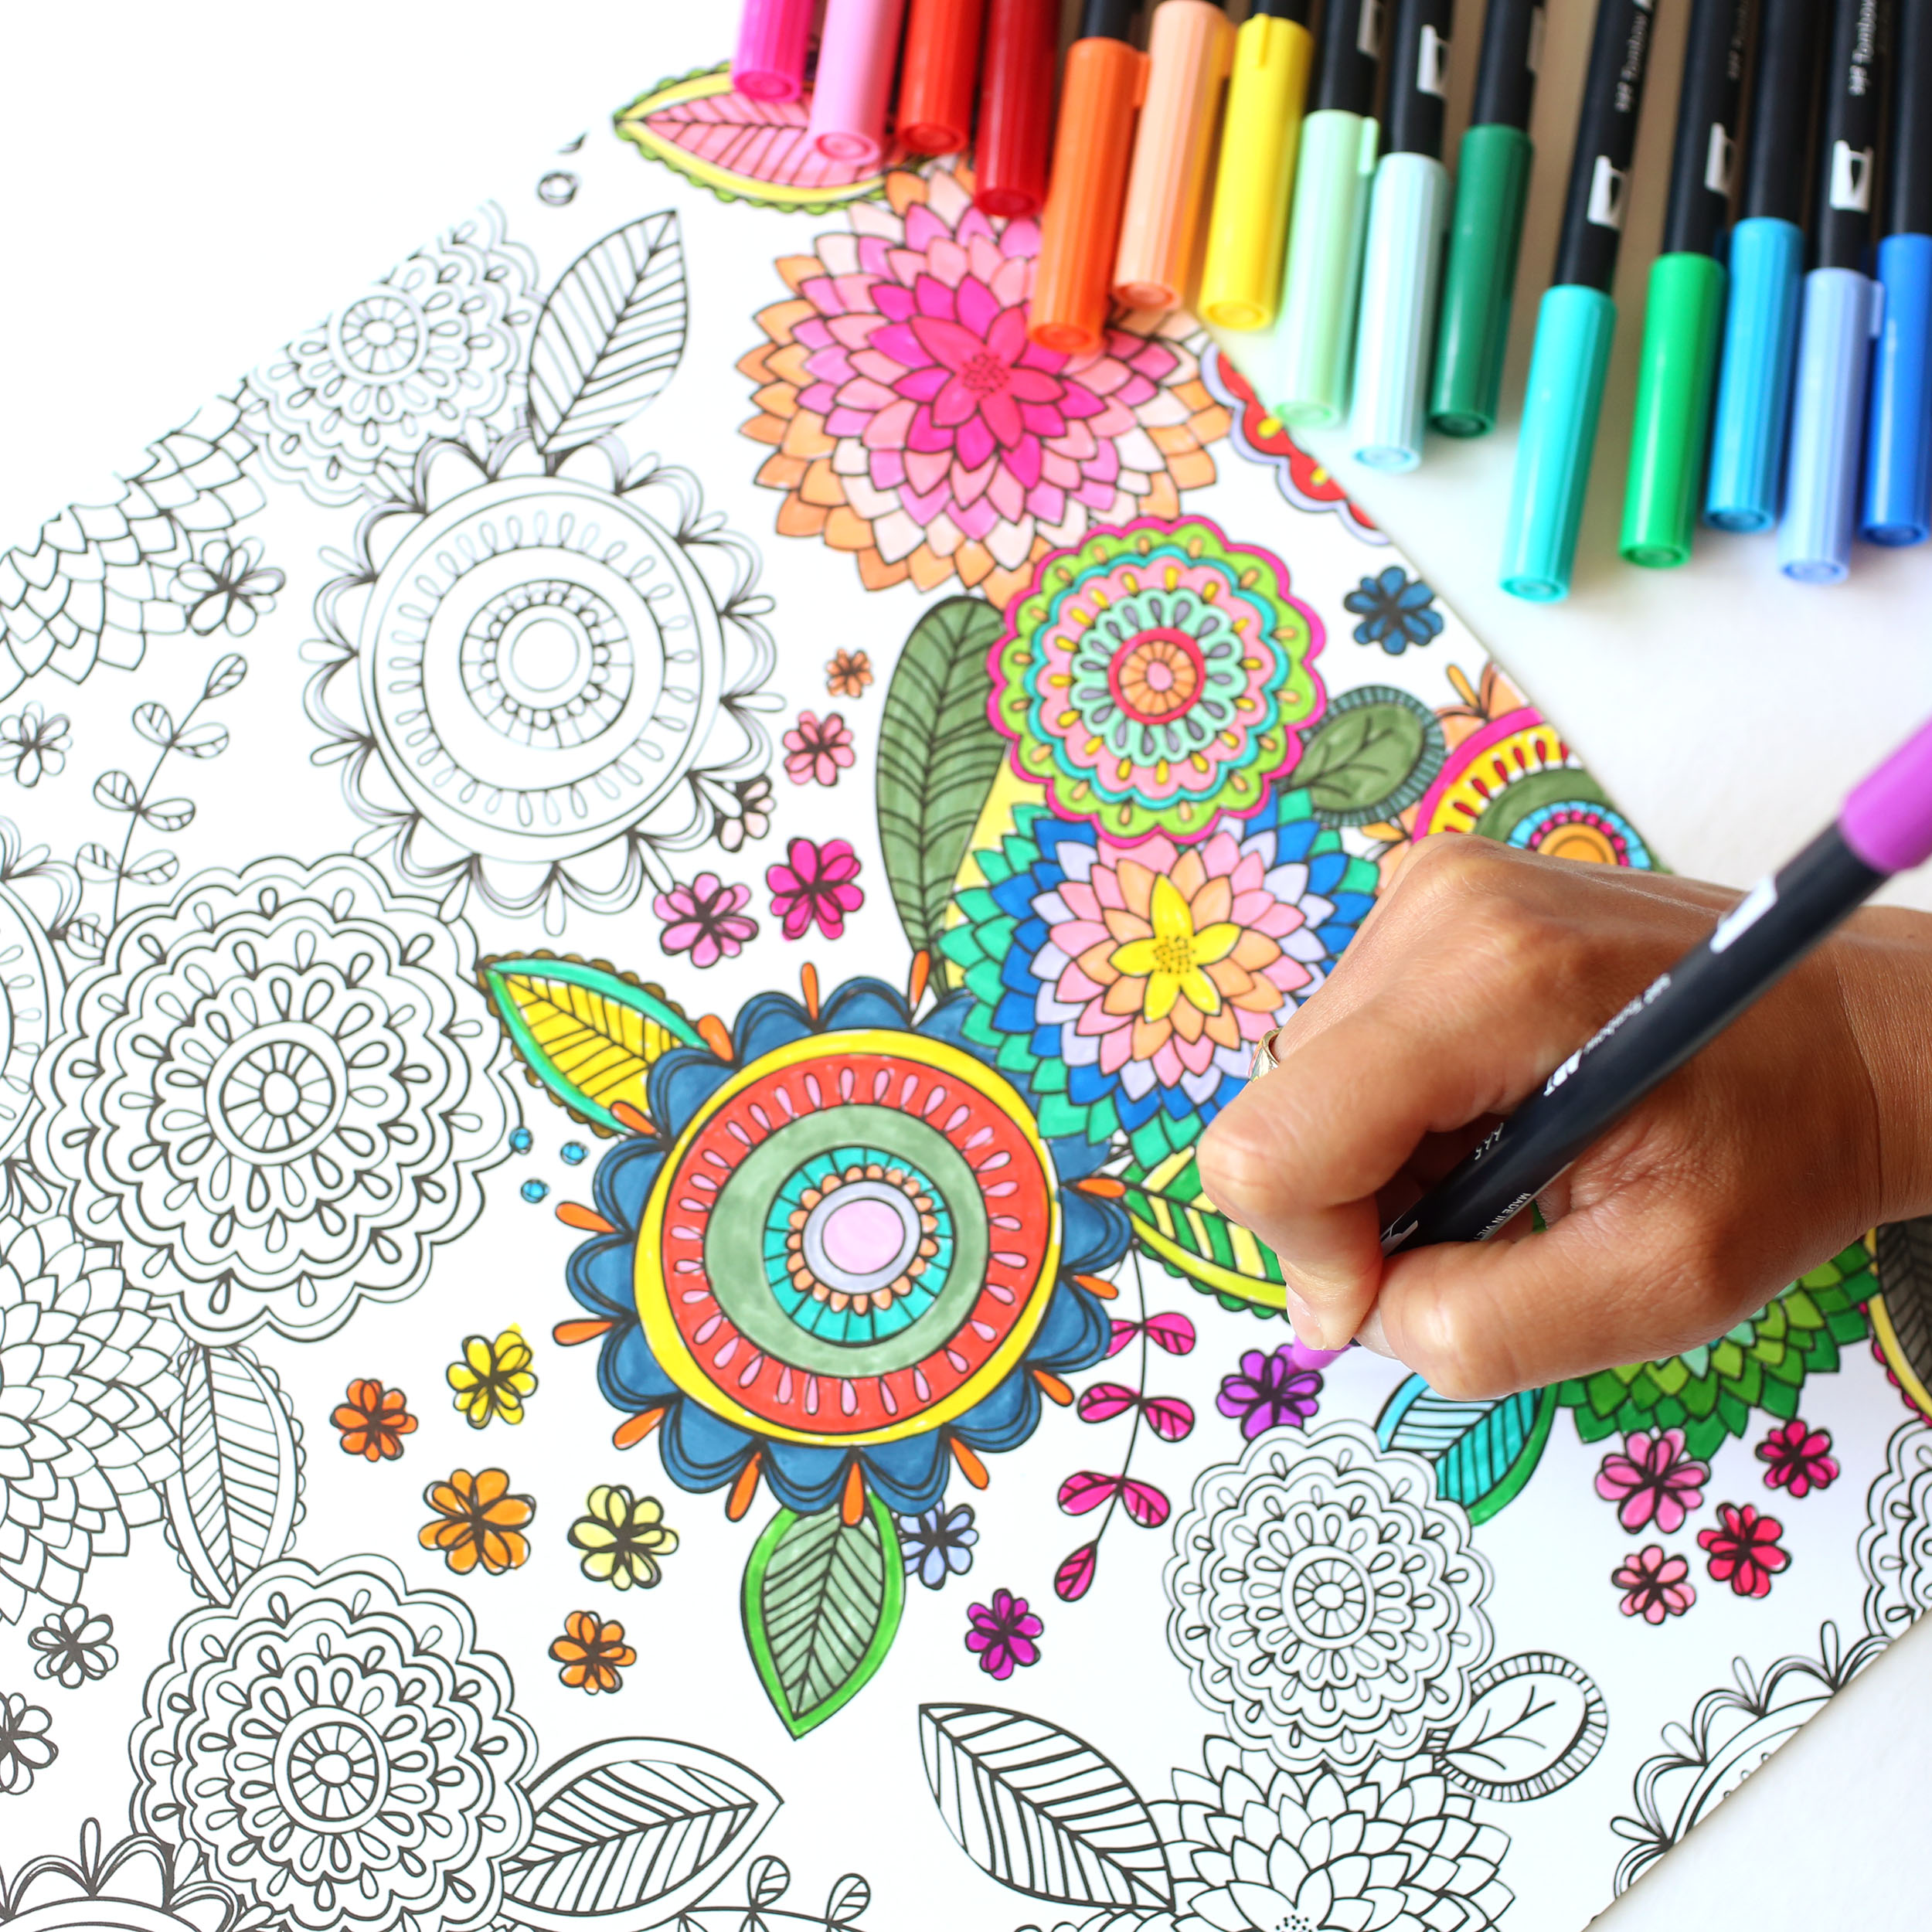 amy_handcoloring.jpg